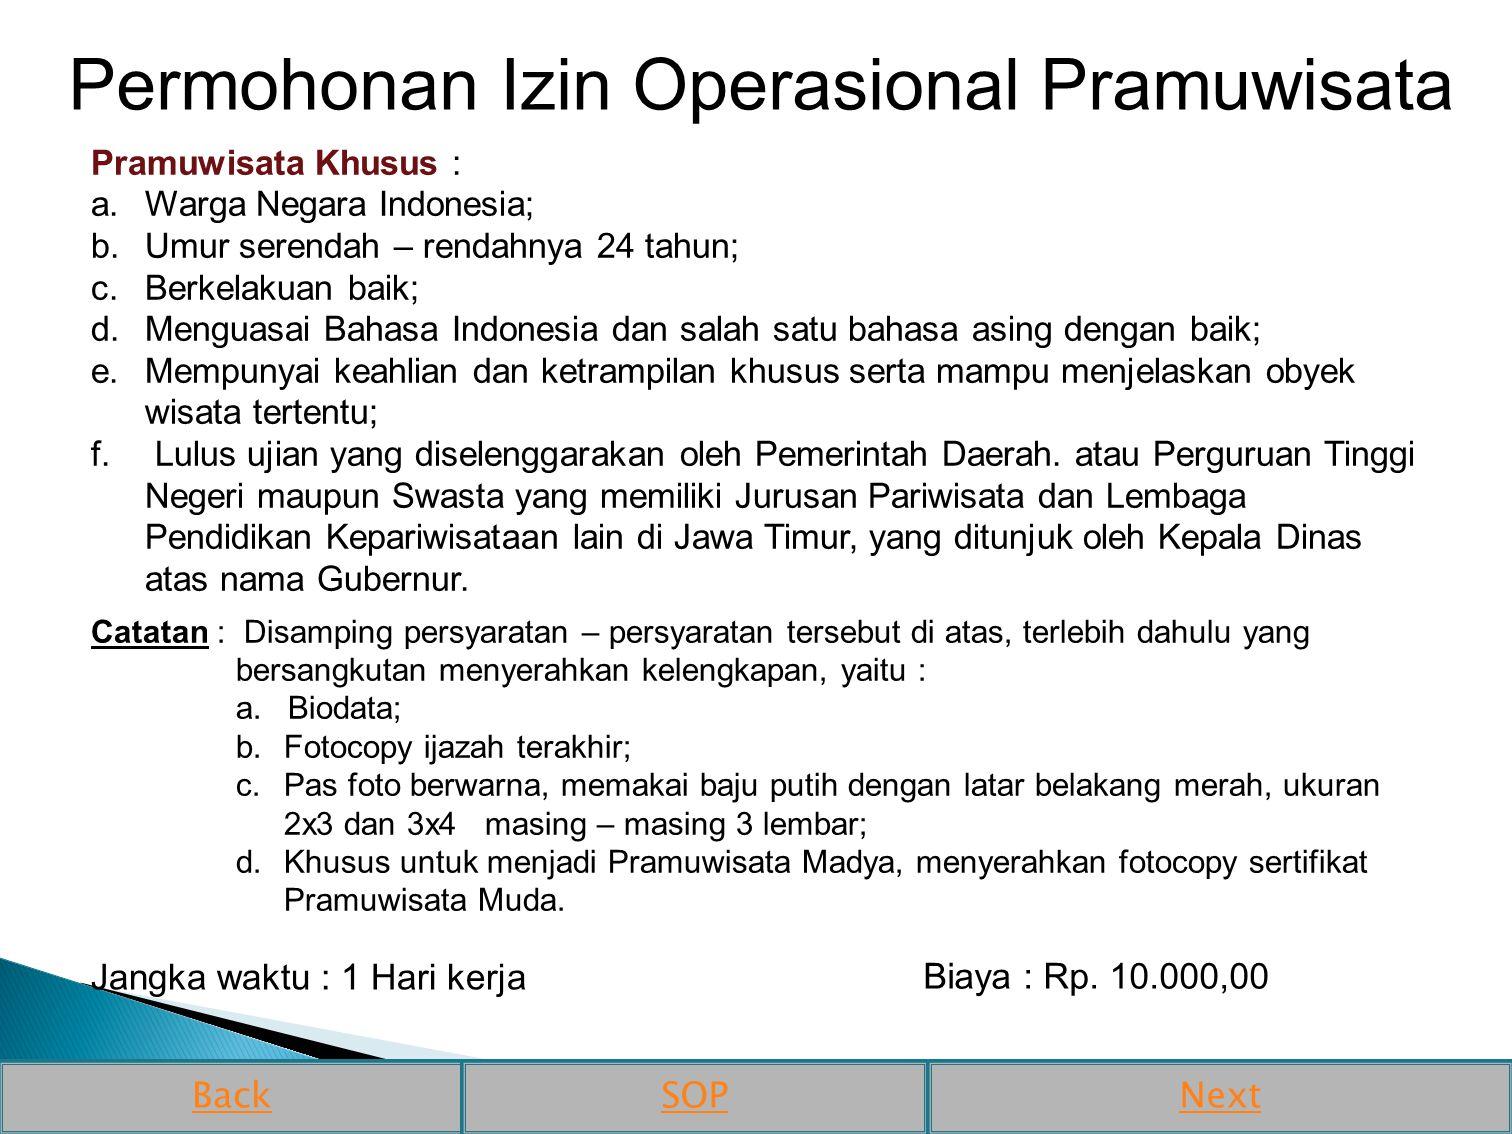 Pramuwisata Khusus : a.Warga Negara Indonesia; b.Umur serendah – rendahnya 24 tahun; c.Berkelakuan baik; d.Menguasai Bahasa Indonesia dan salah satu b